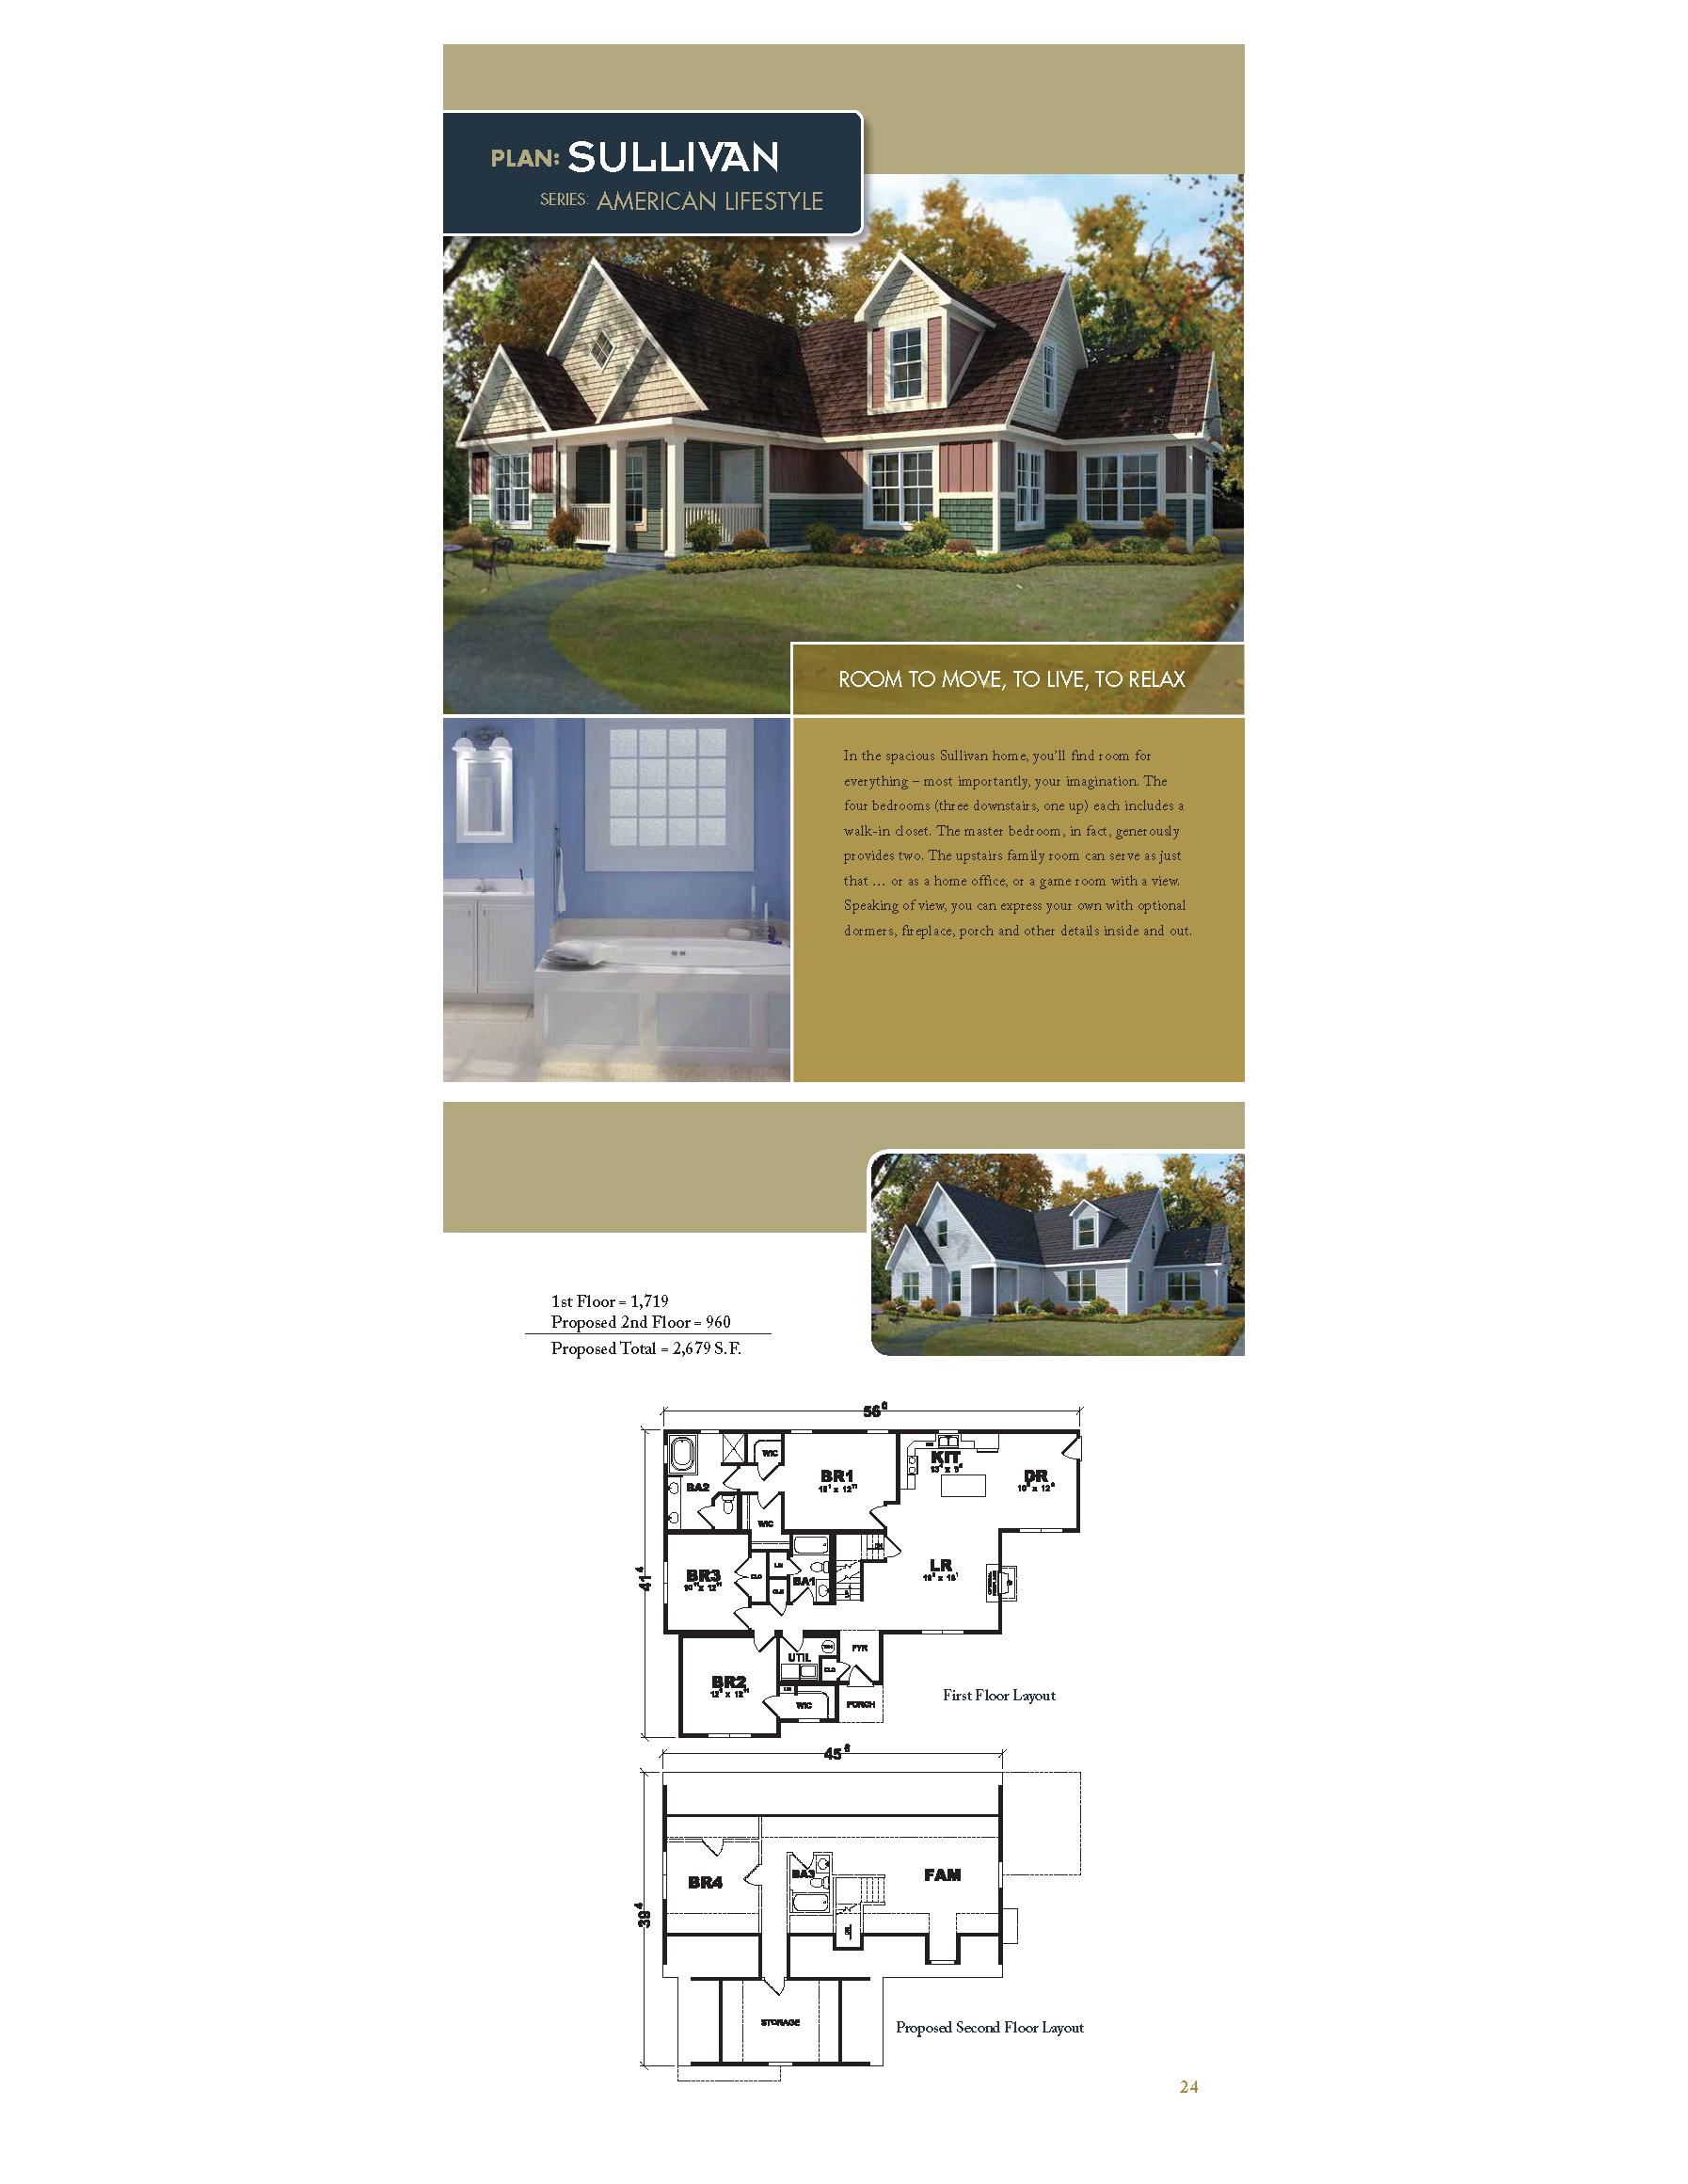 Oasis Homes Sullivan Modular Ranch Value on